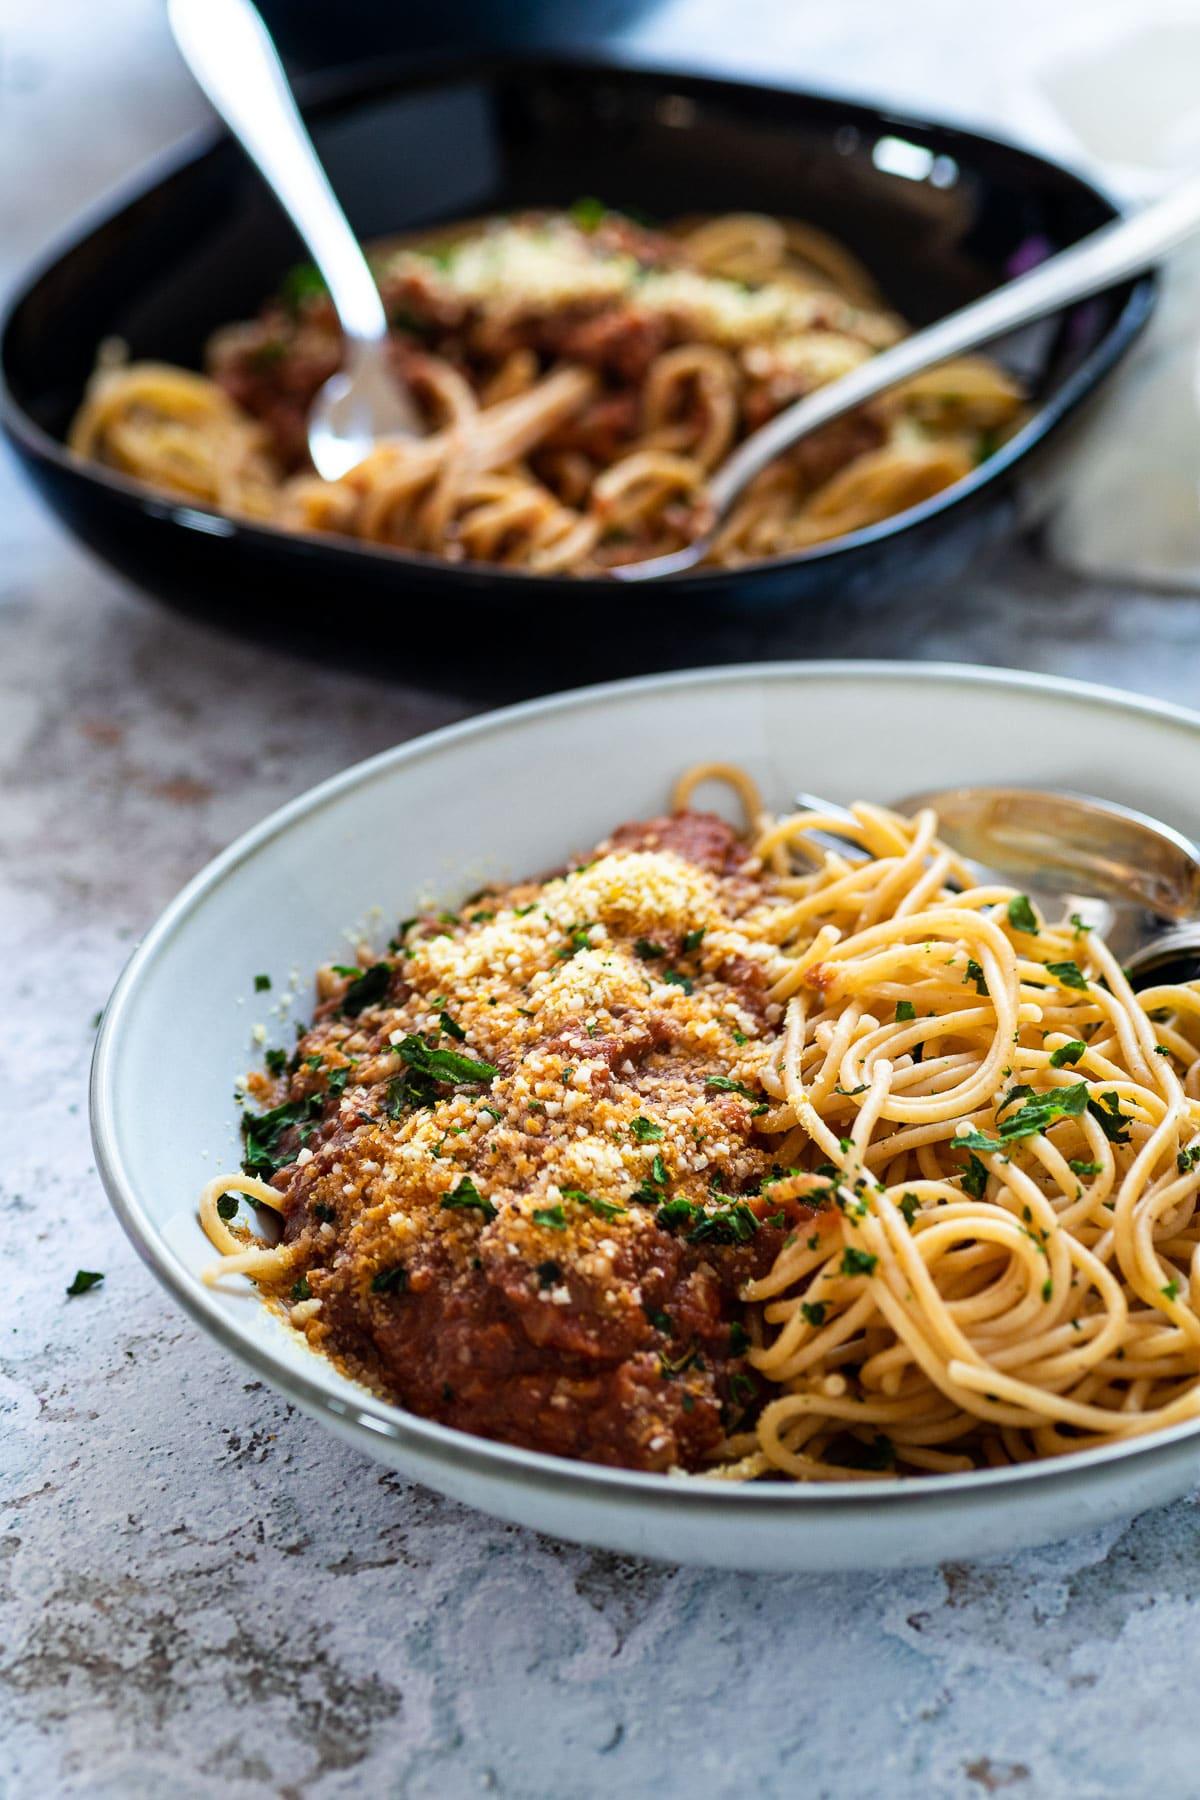 Spaghetti-Schüssel mit Bolognese-Sauce